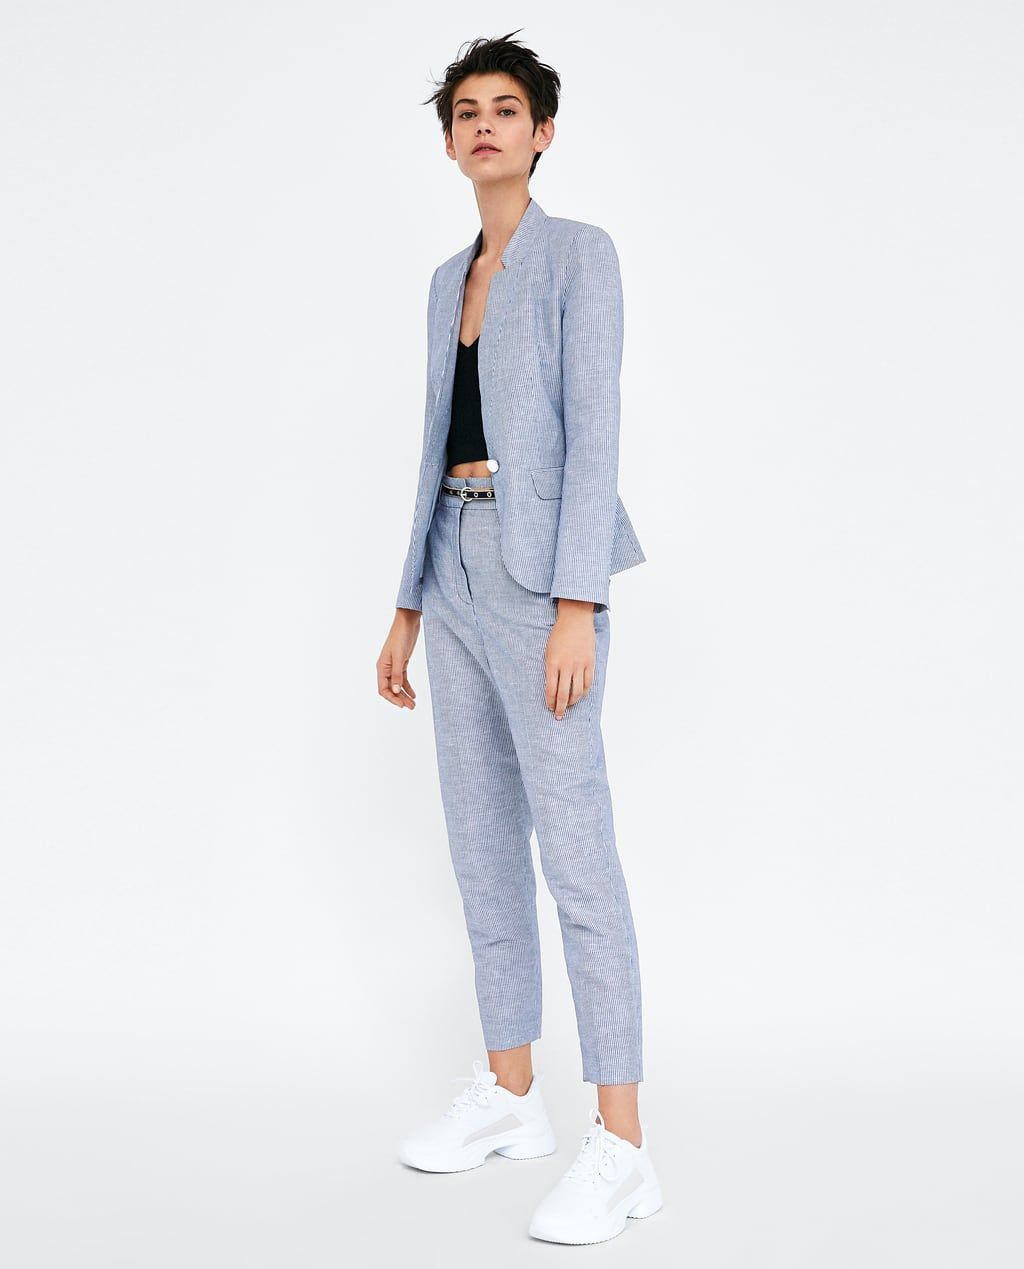 Moderne Kleding Dames.Dames Pakken Nieuwe Collectie Online Zara Nederland Kleding In